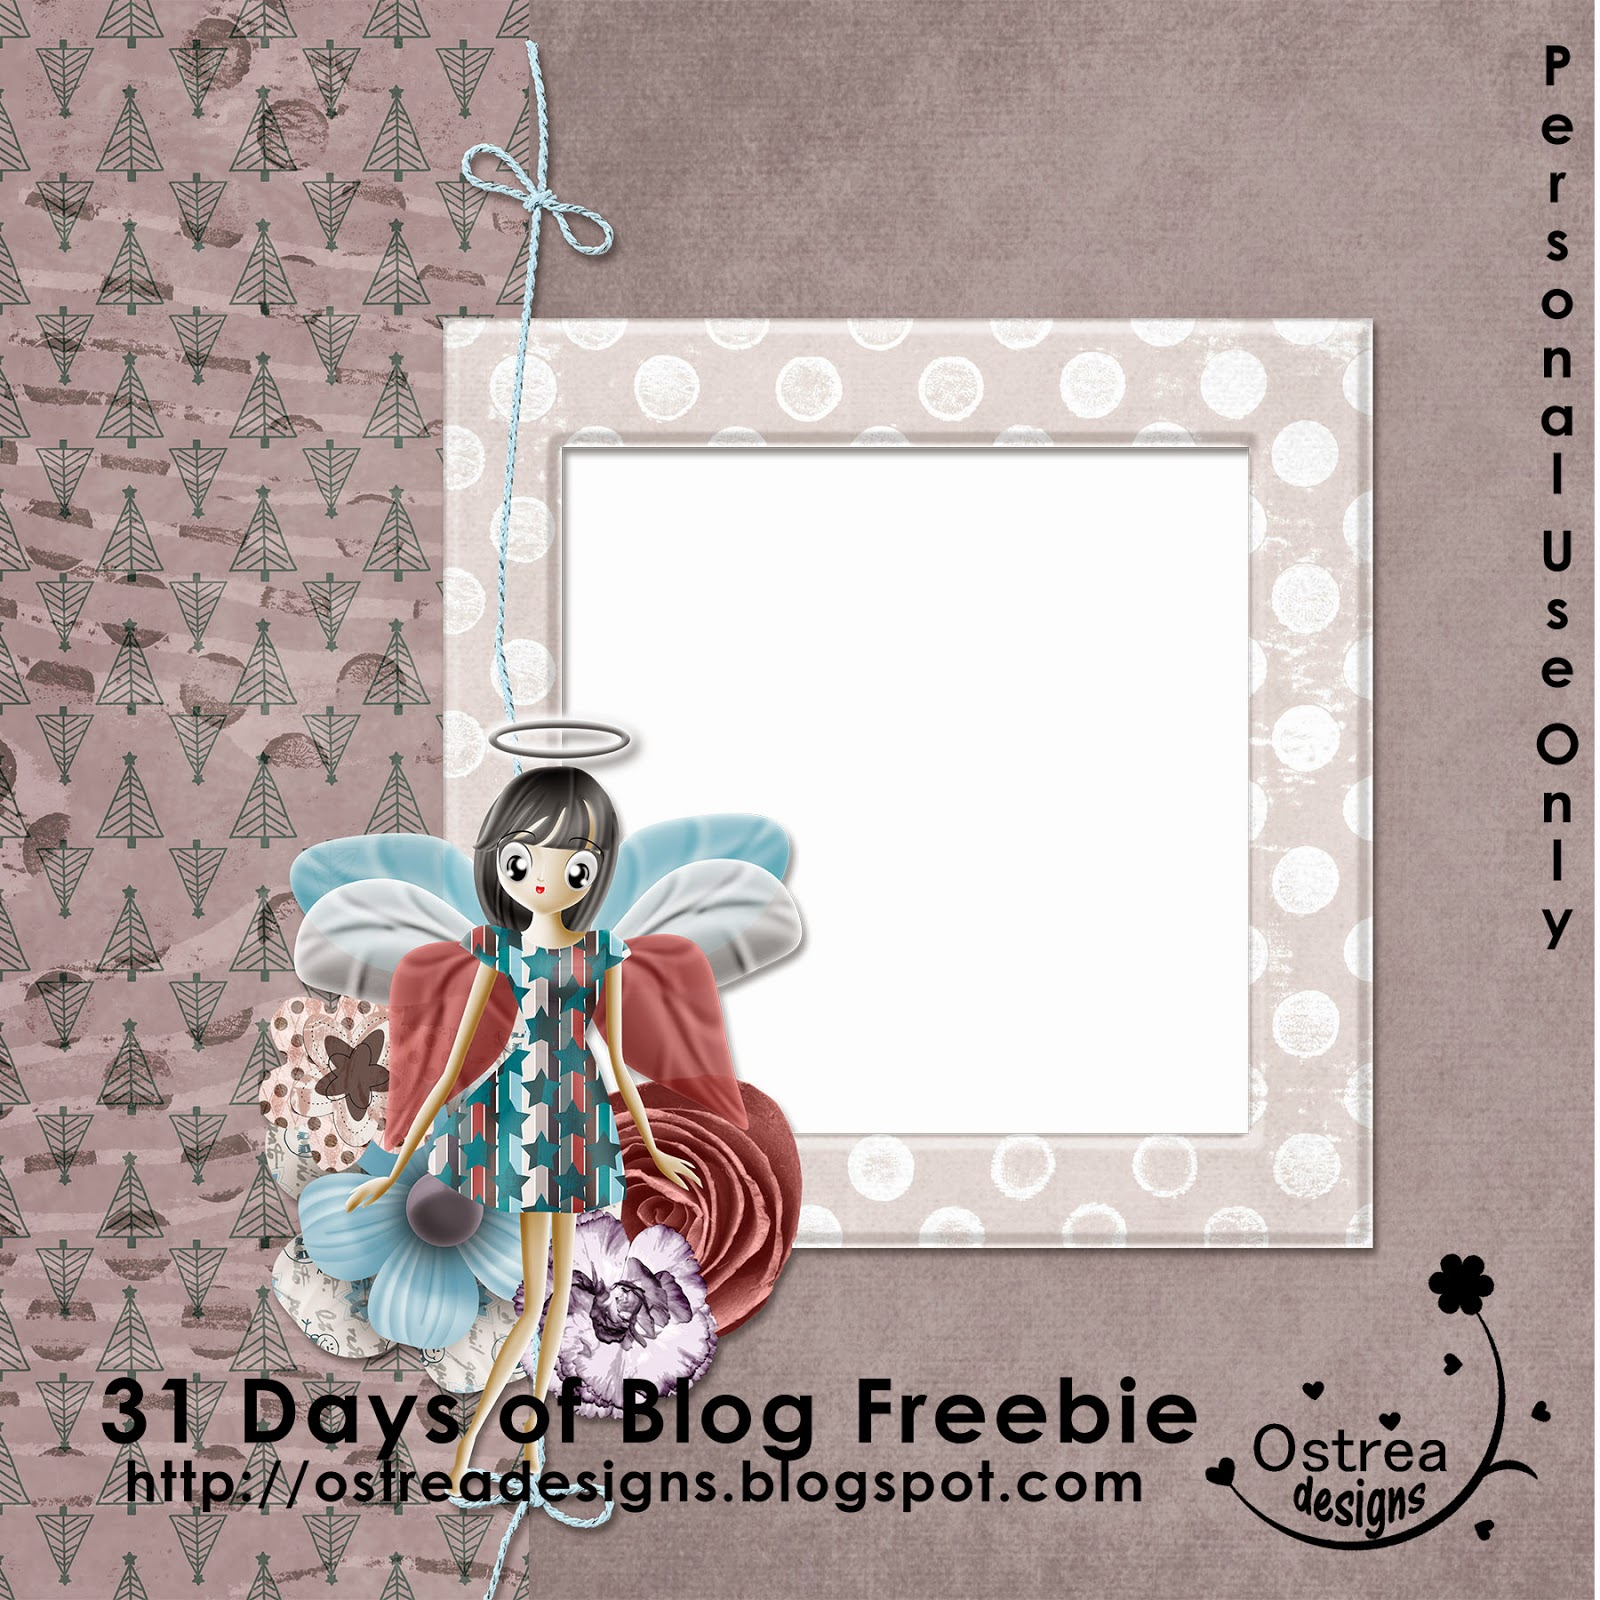 http://2.bp.blogspot.com/-Q6xOePi5siU/VHd7syG_XhI/AAAAAAAABkU/V5nJiCQUDRI/s1600/OstreaDesigns_Dec28p.jpg